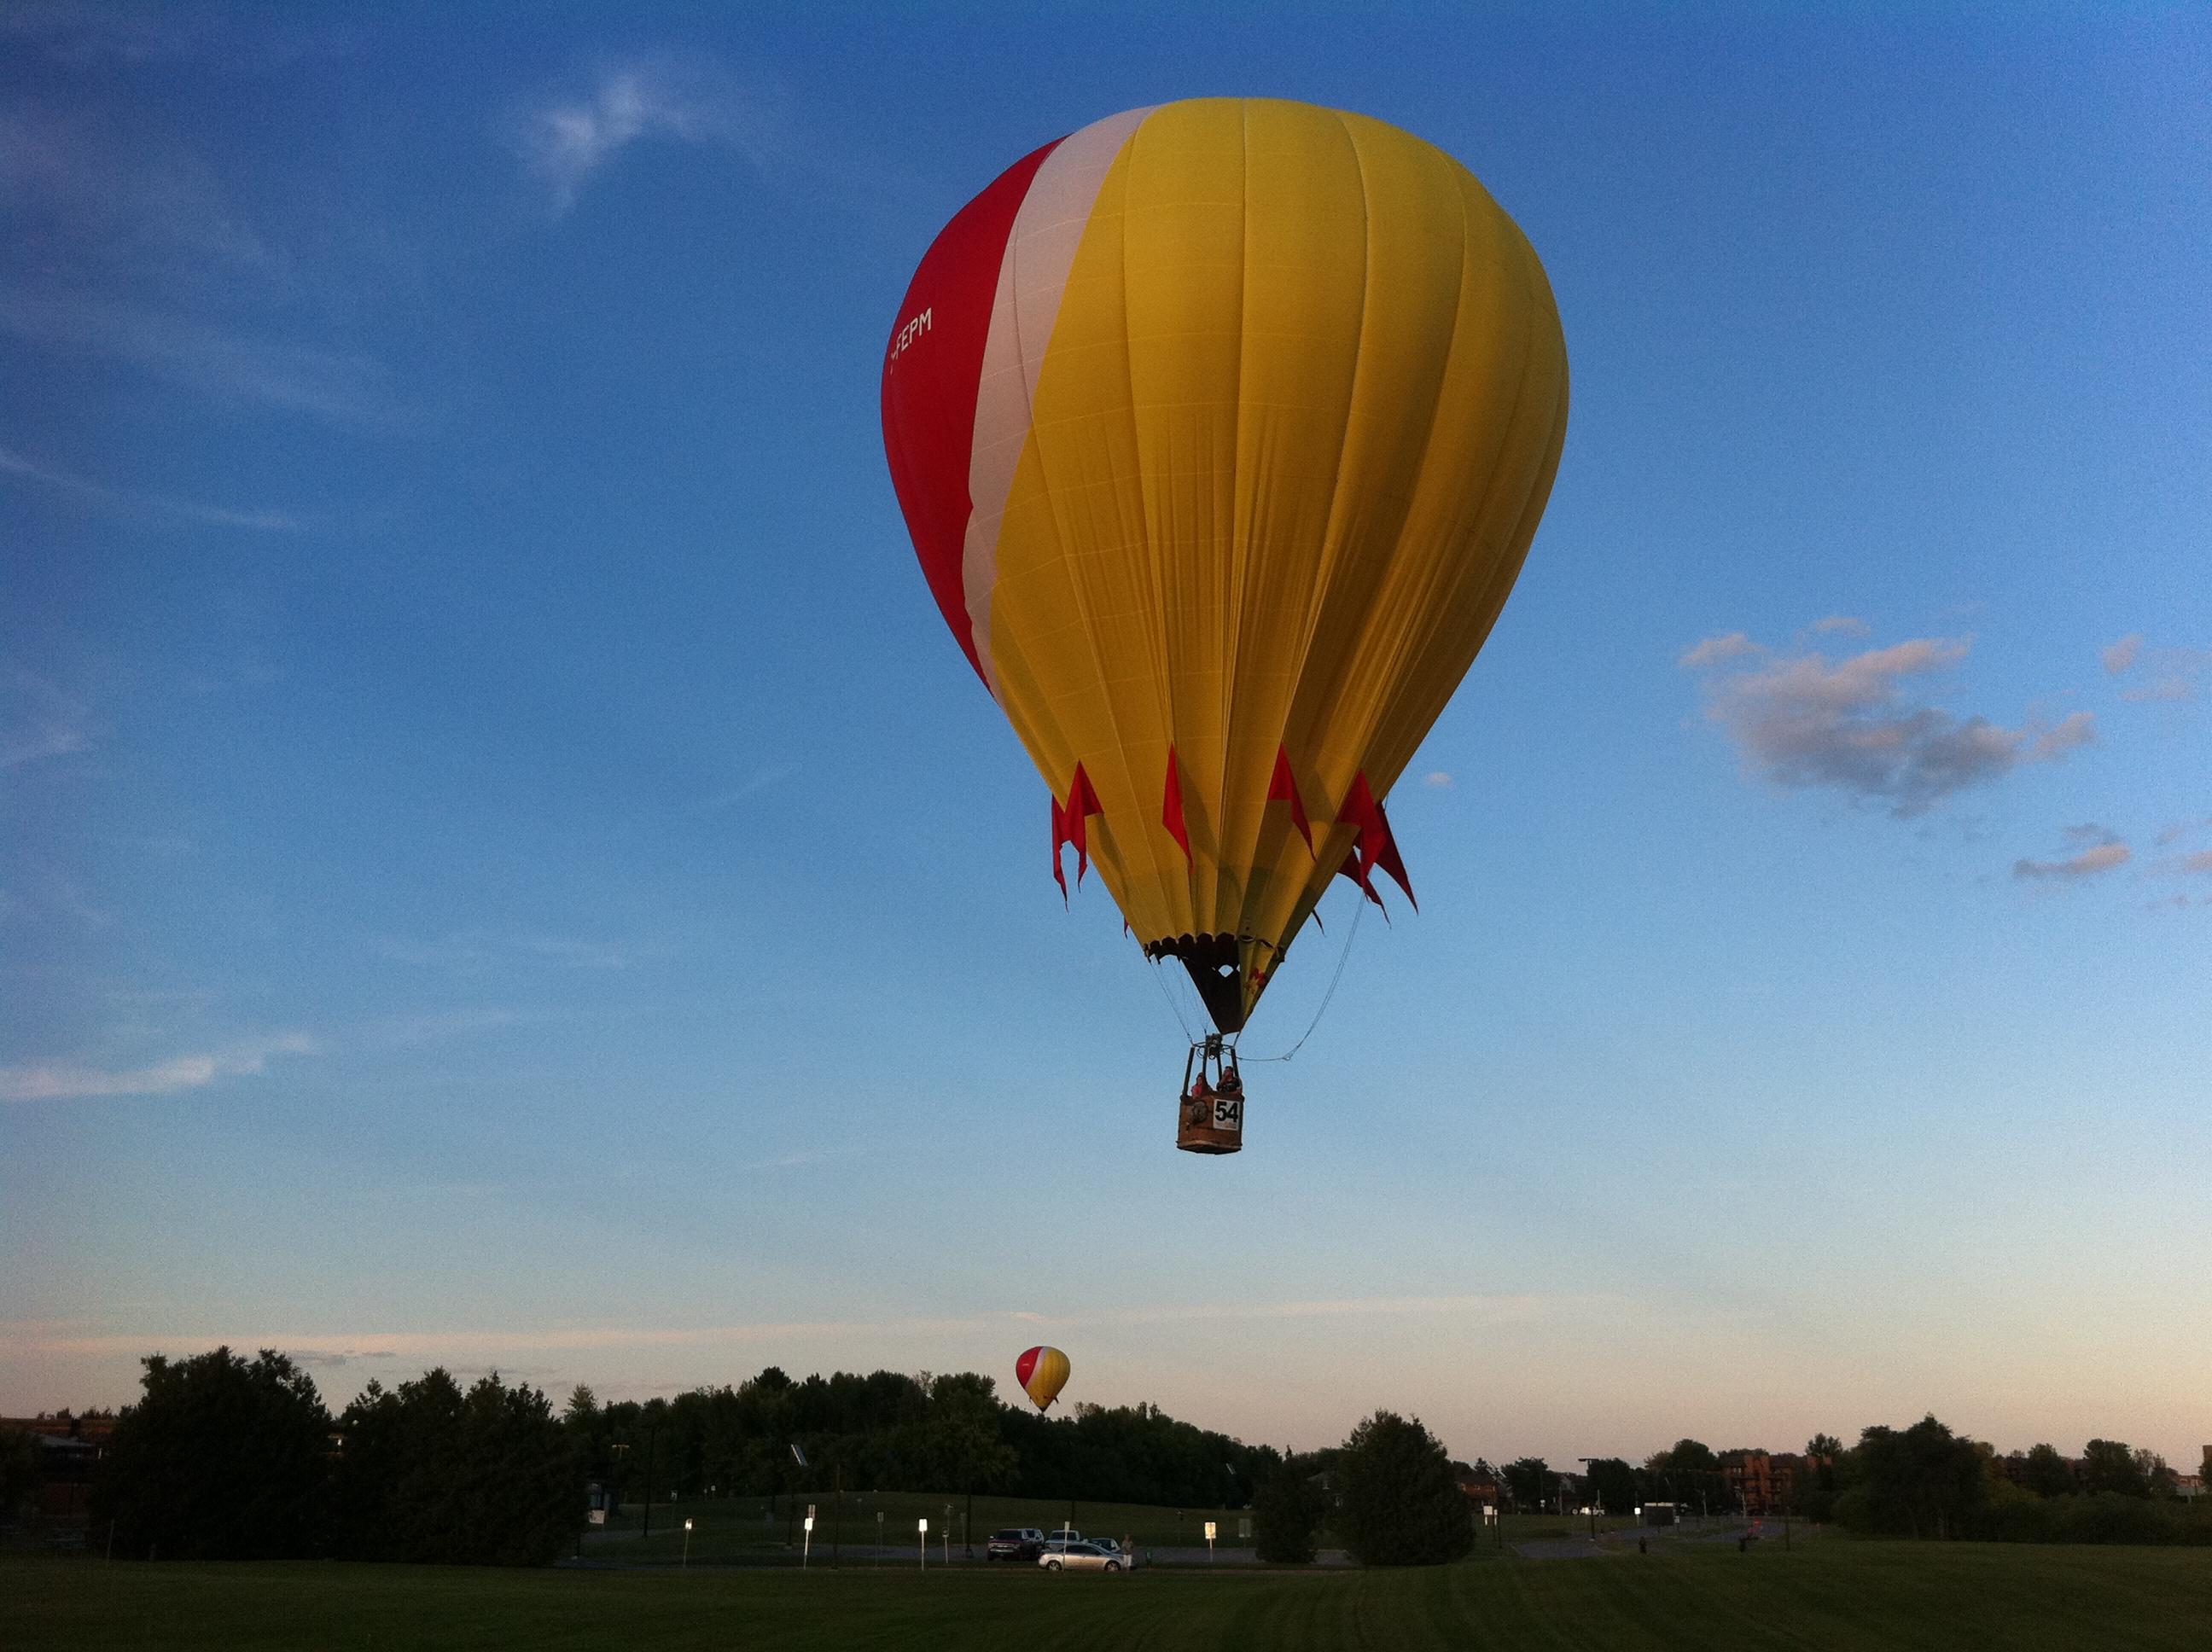 baloon coming down